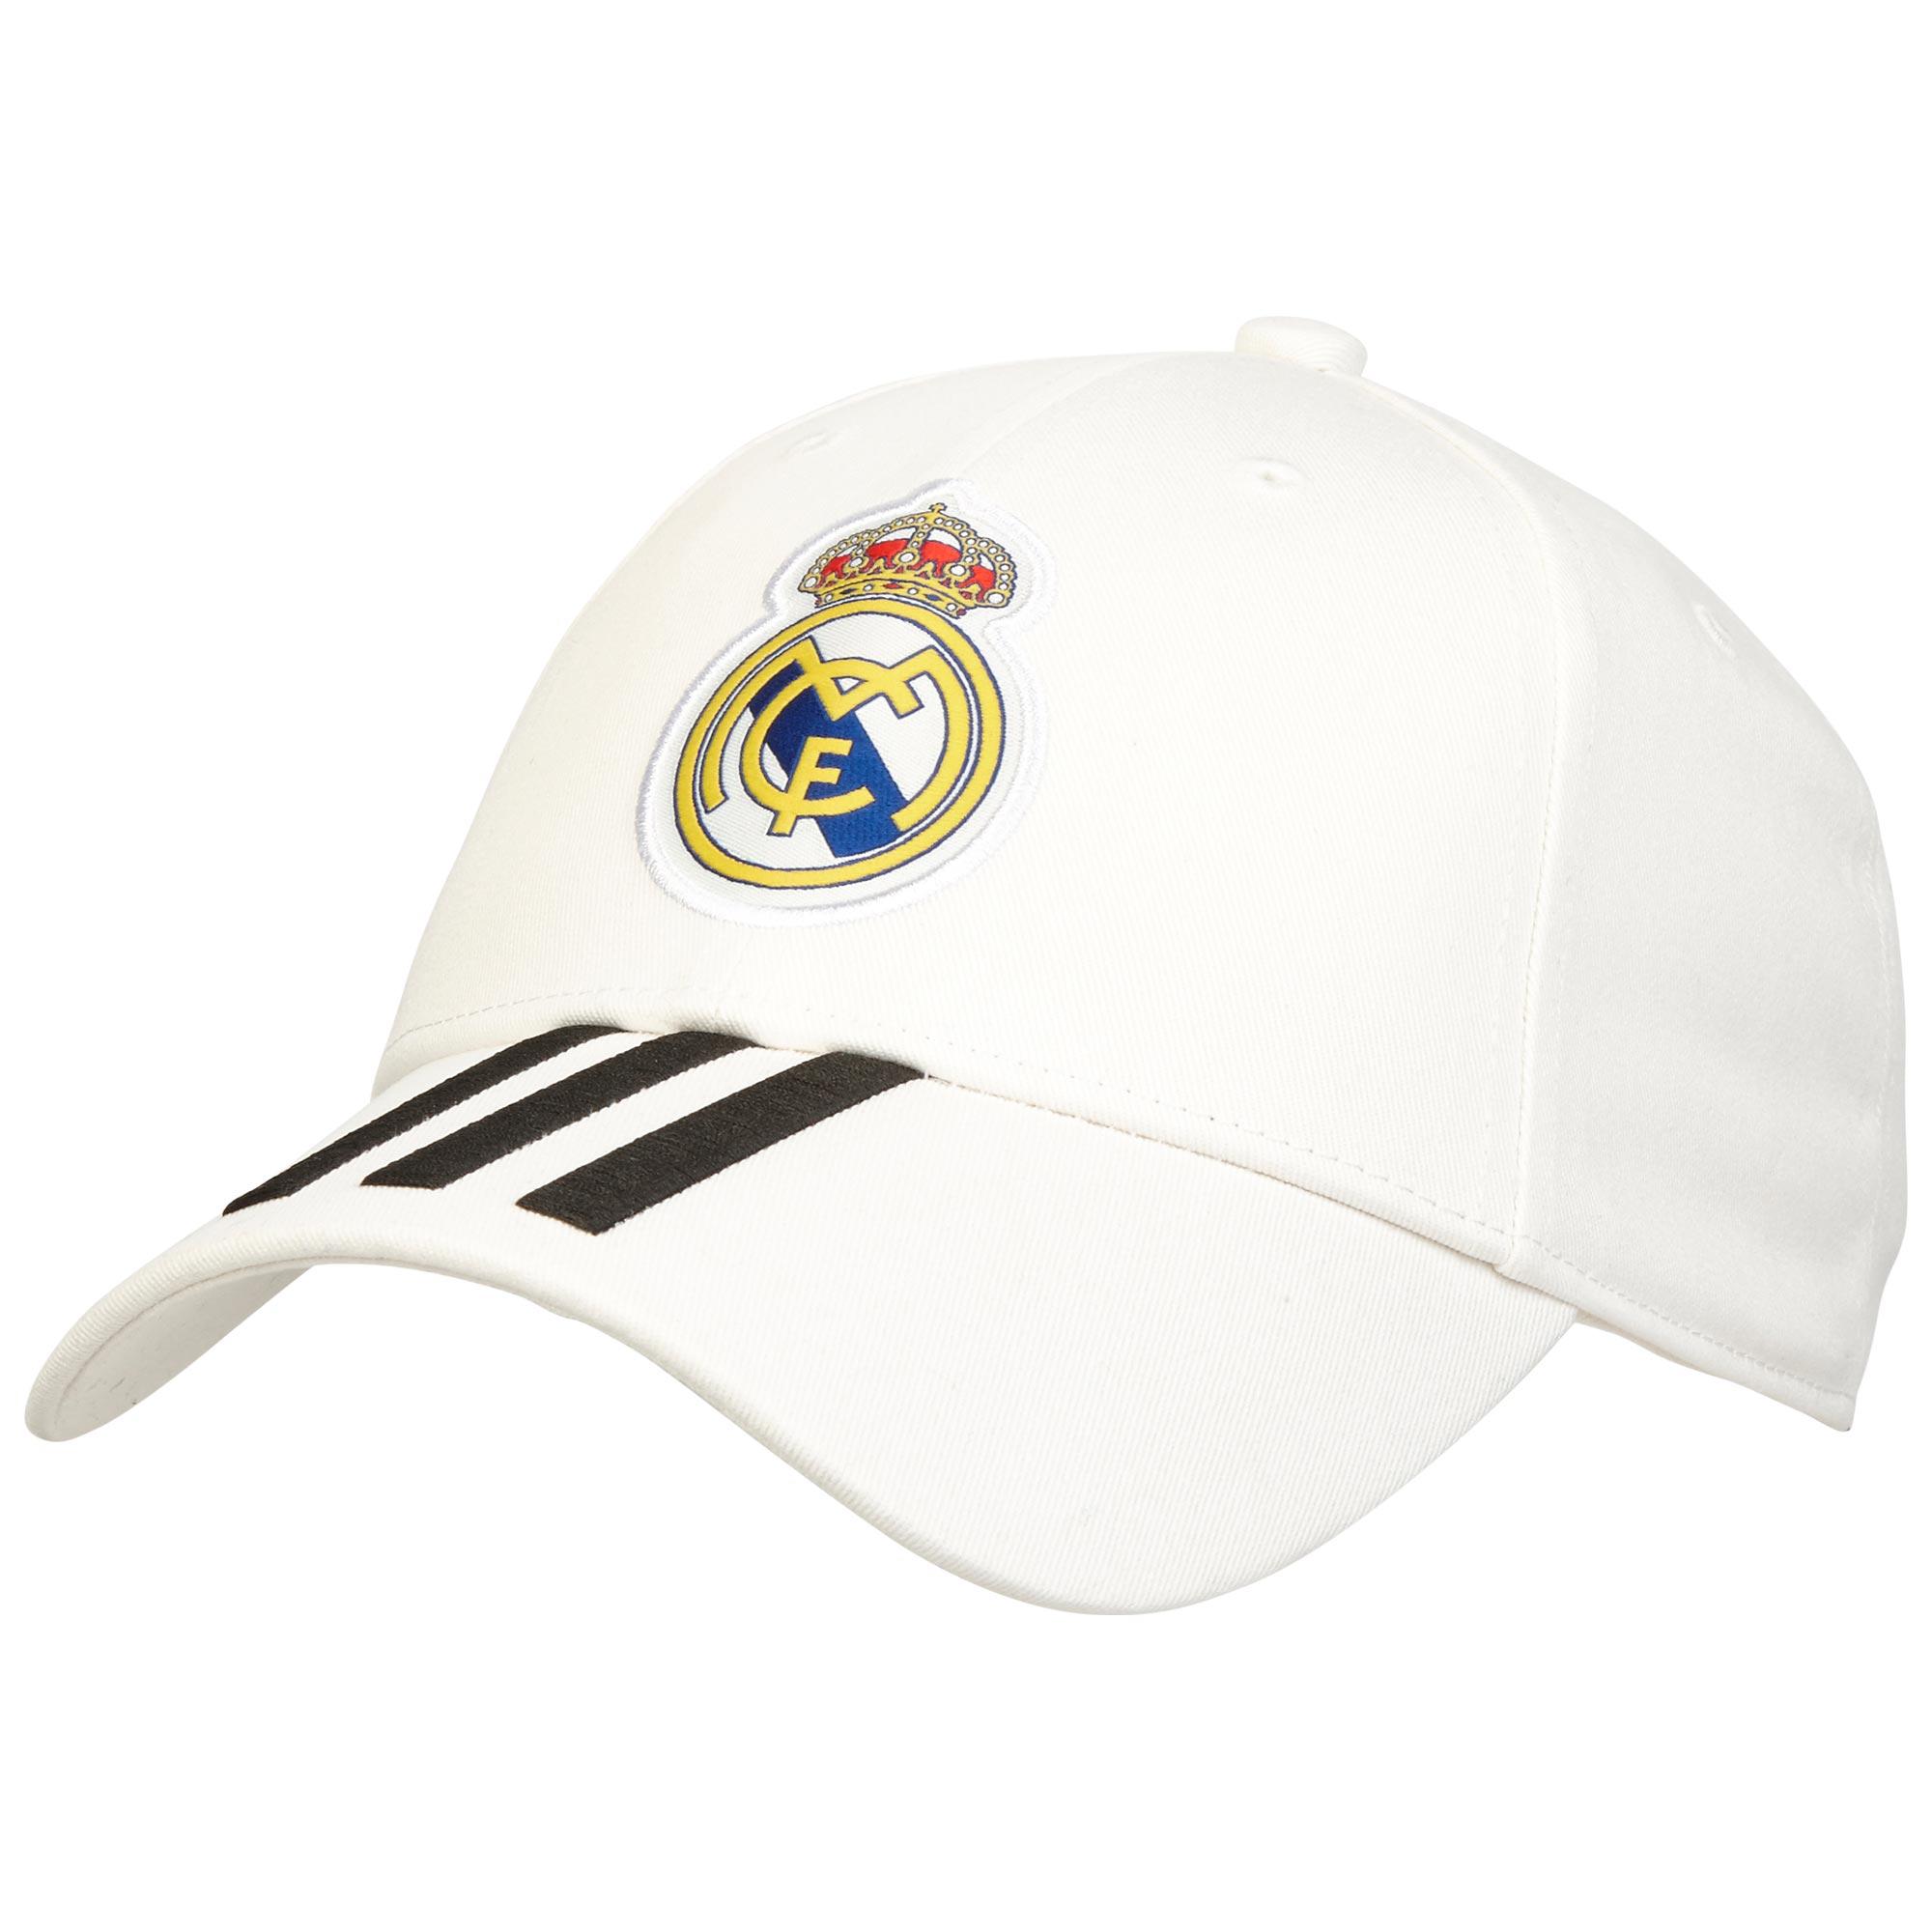 Image of Real Madrid 3 Stripe Cap - White